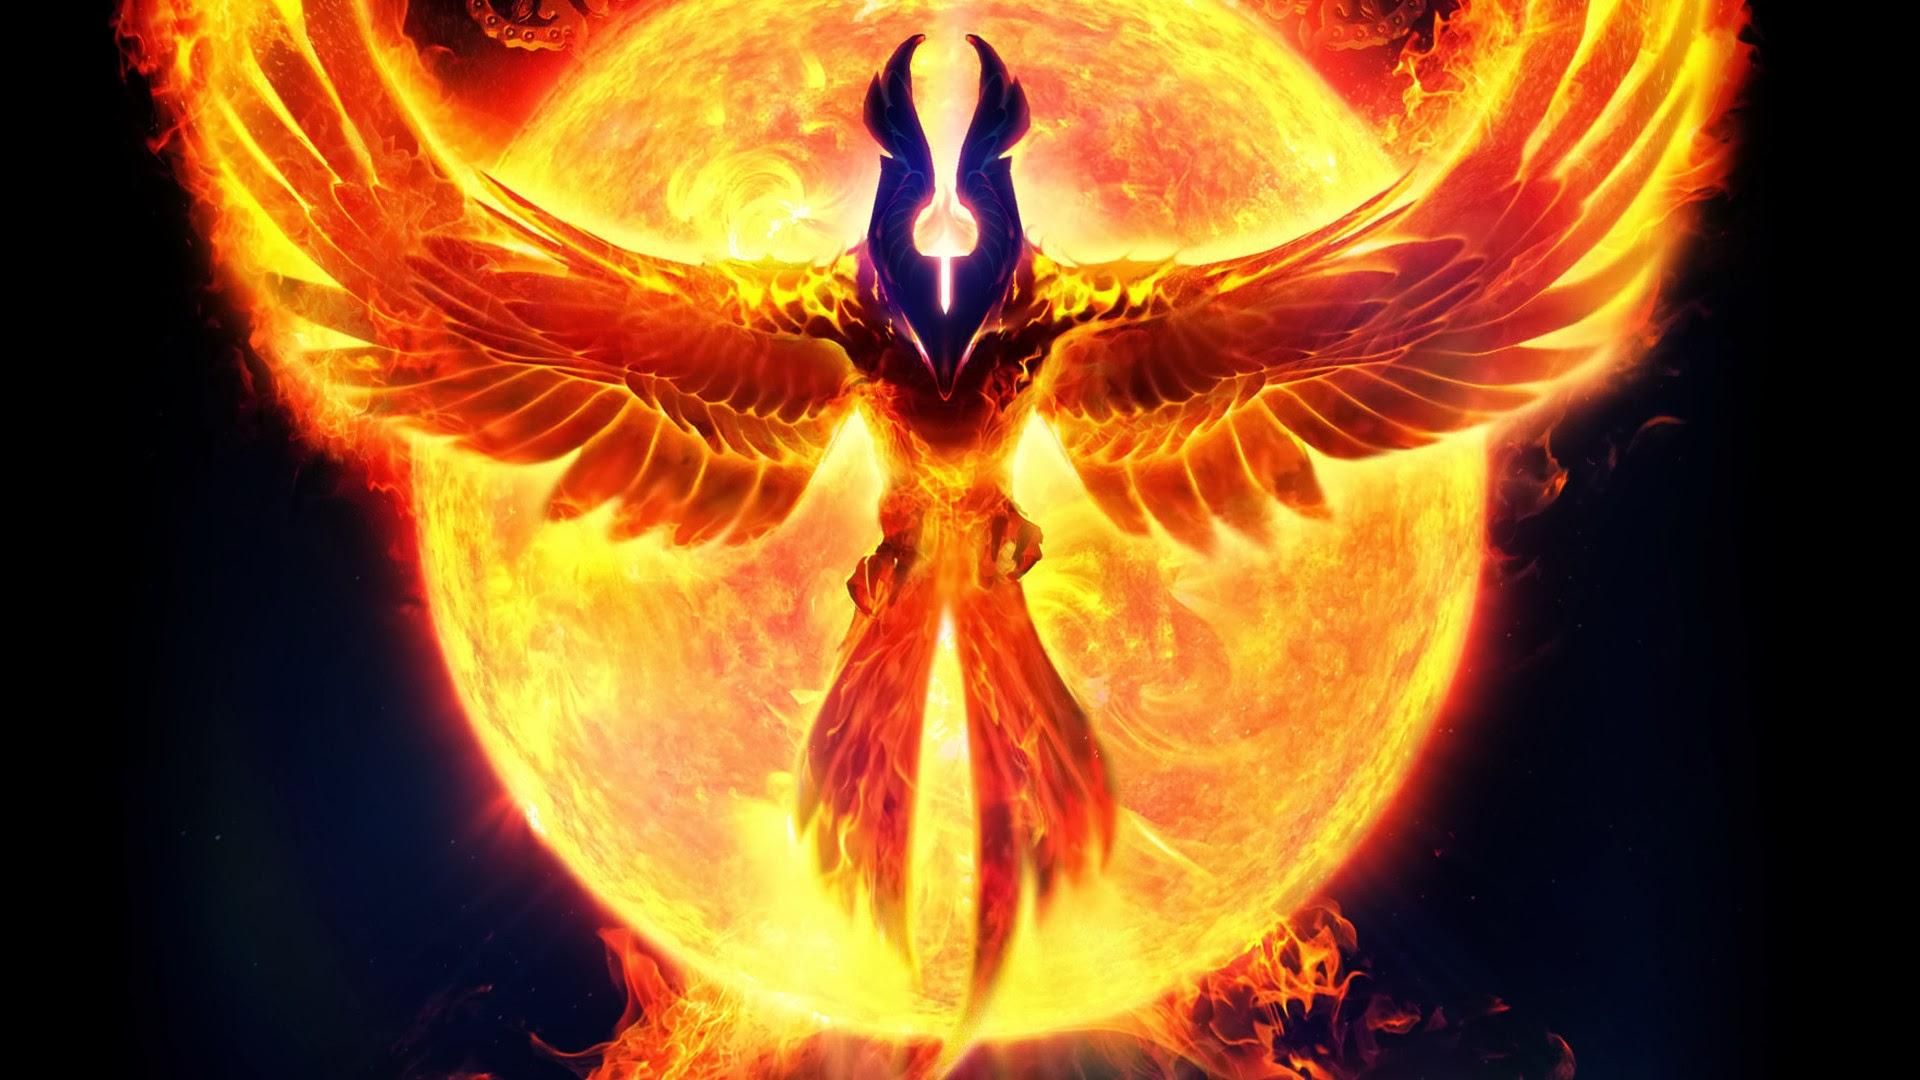 icarus the phoenix dota 2 hero hd wallpaper image picture 1920x1080 5v 1920x1080